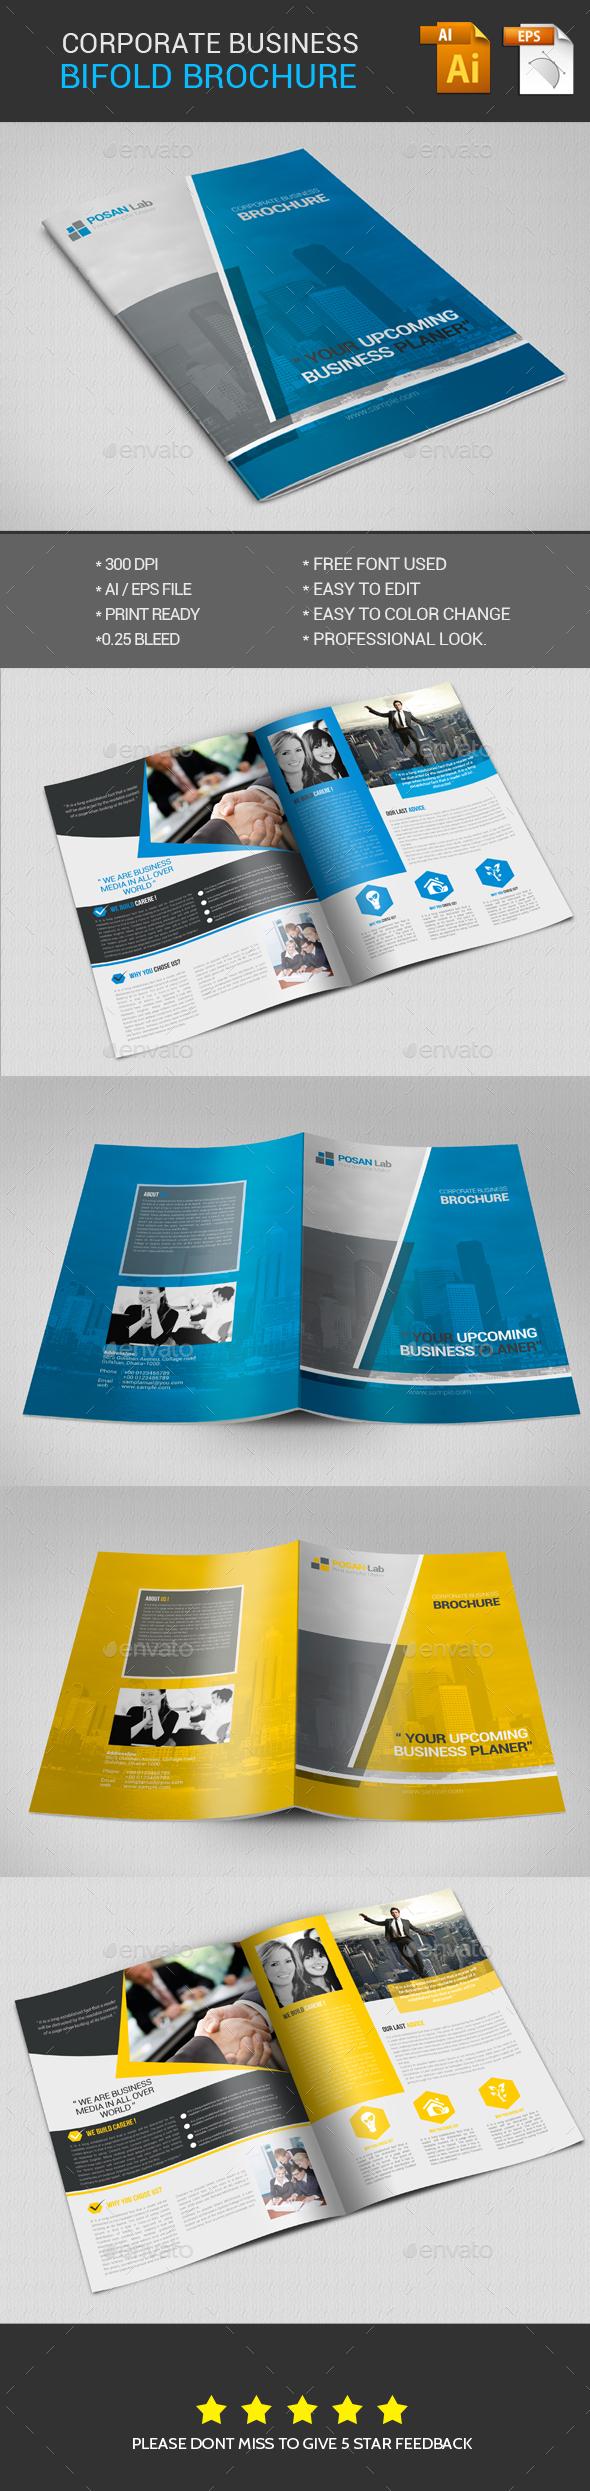 Corporate Business Bifold Brochure - Brochures Print Templates